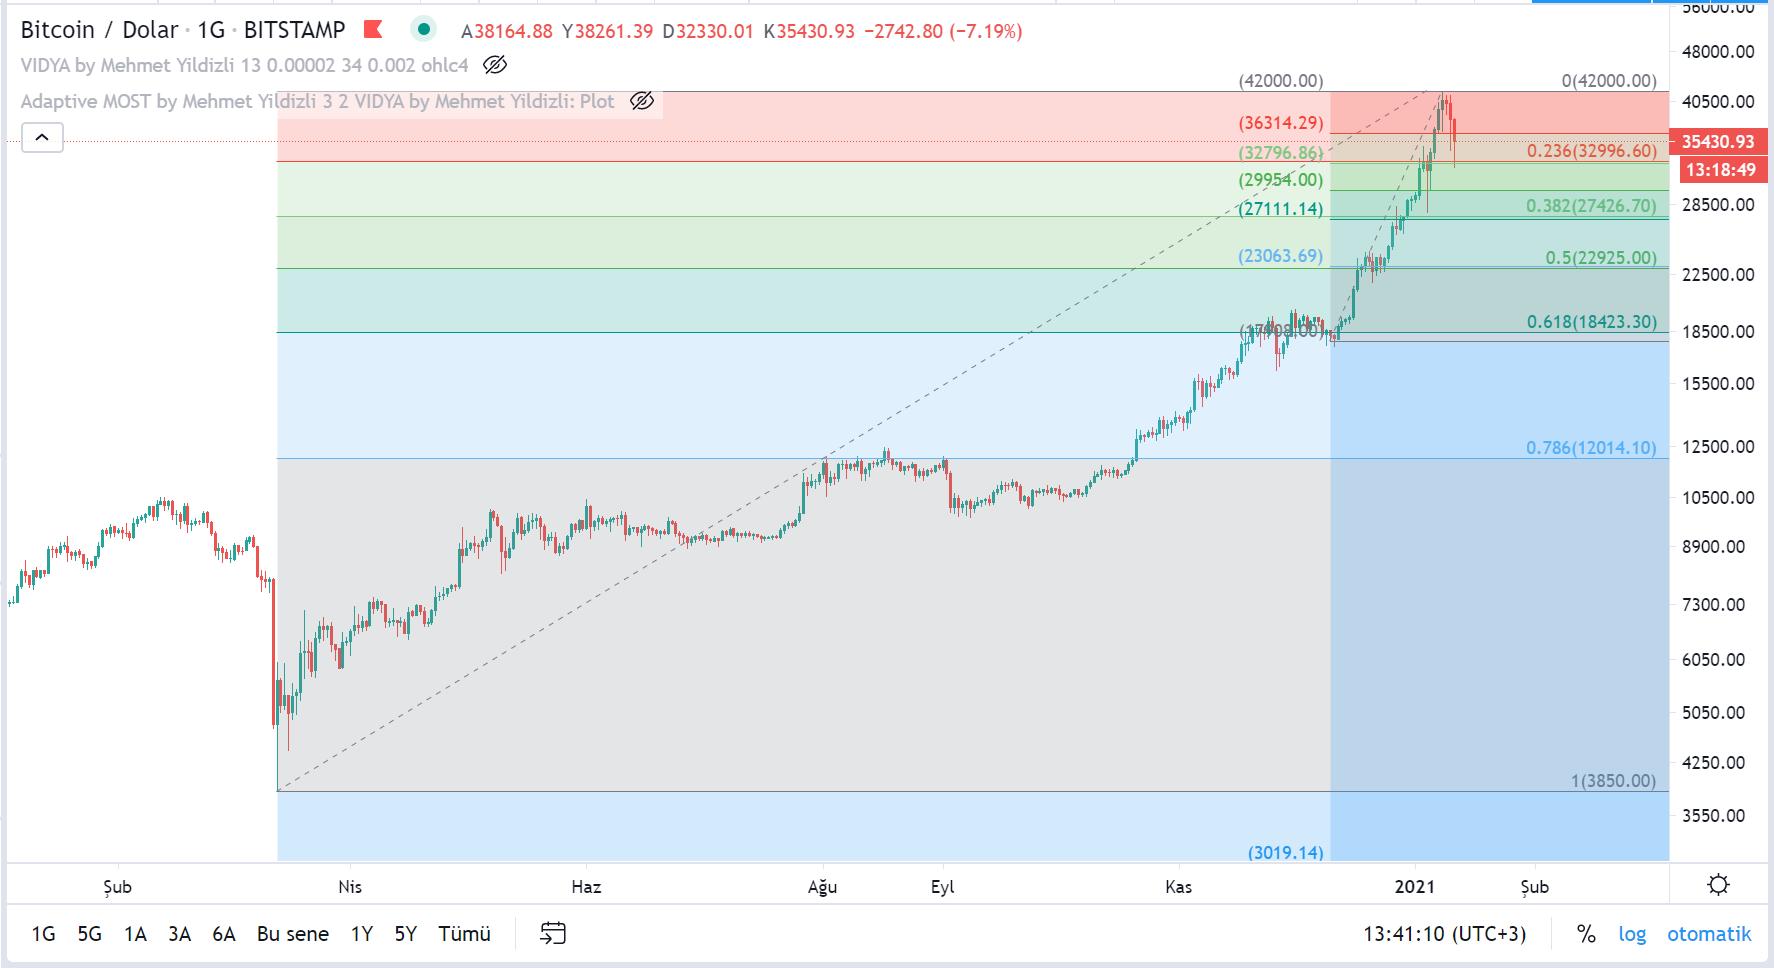 bitcoinin dolar bazinda teknik analizi 11 ocak 2021 3